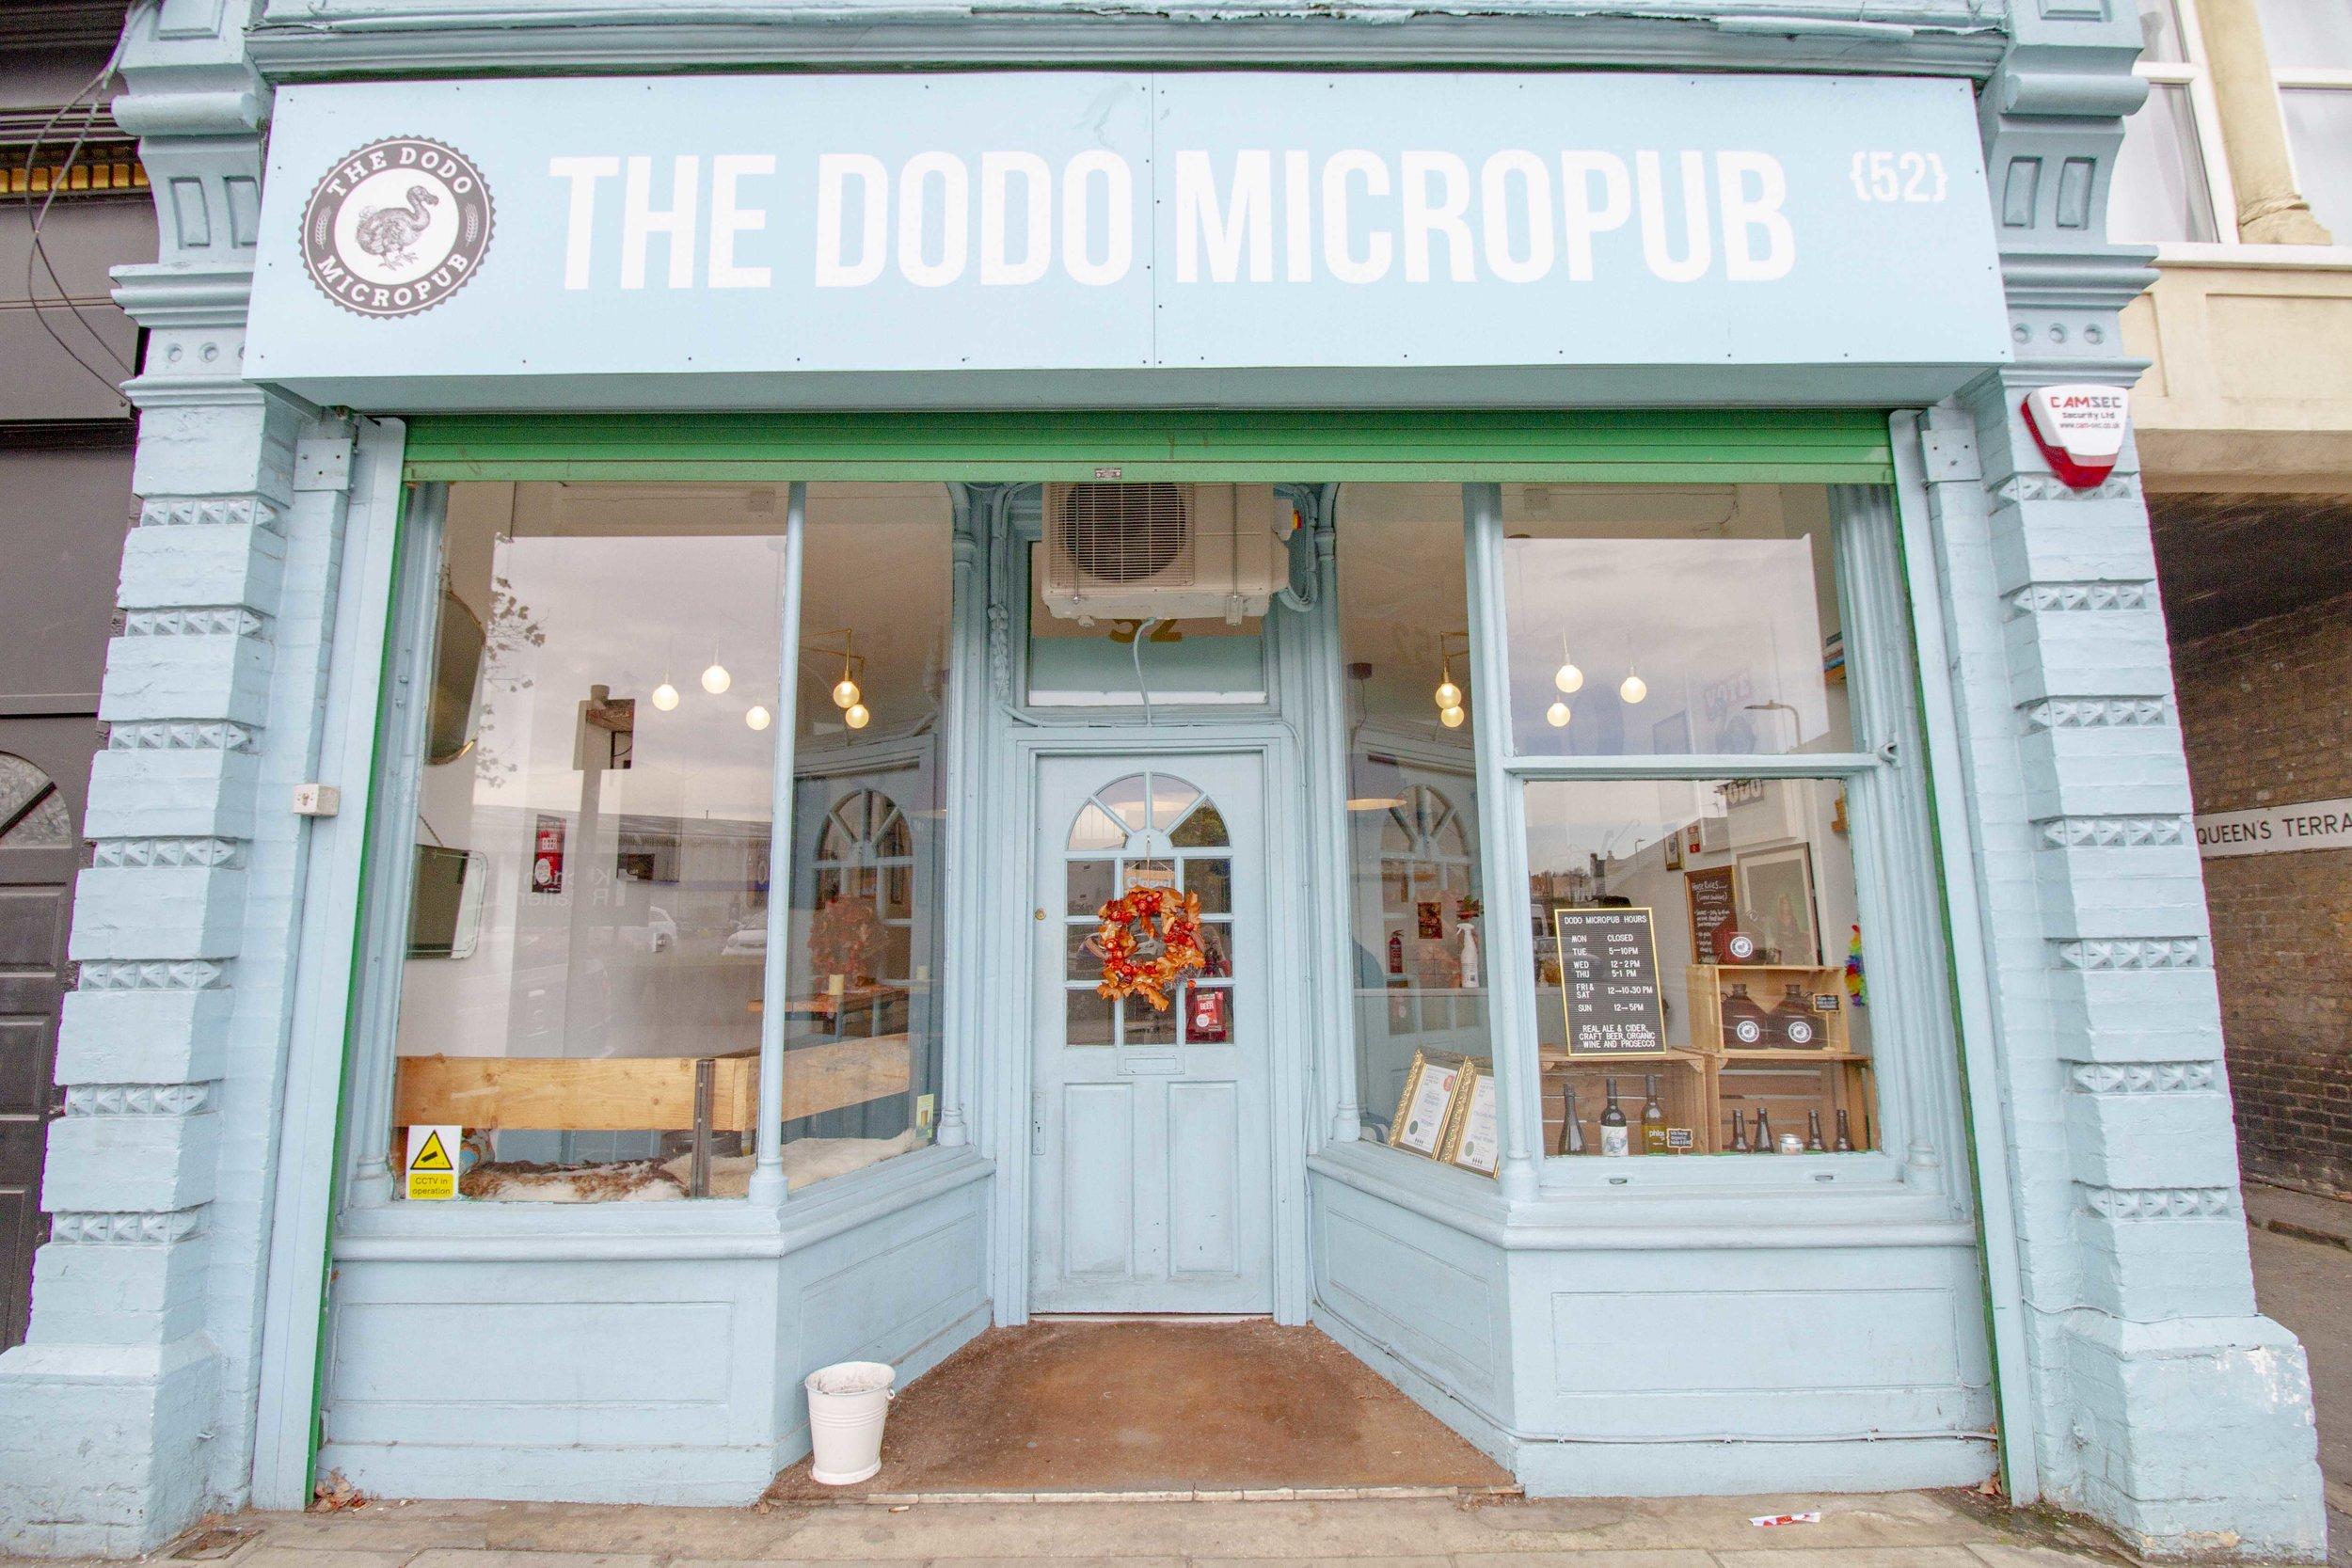 The Dodo Micropub, 52 Boston Road, Hanwell, London. W7 3TR